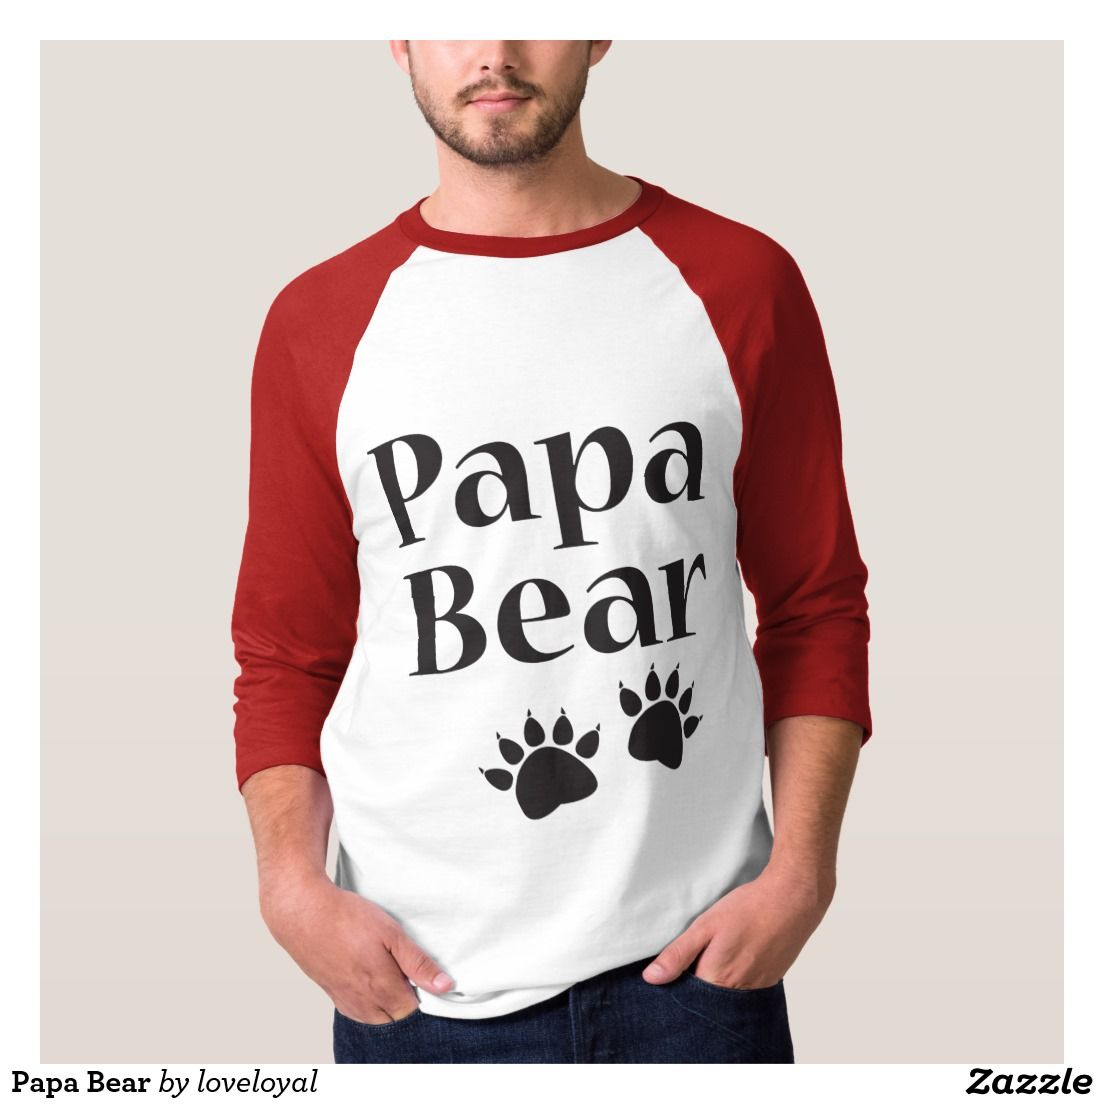 Papa Bear T-Shirt #papabear #poppa #dad #daddy #tshirts #dadshirts #bear #claws #family #mamabear #pawprints